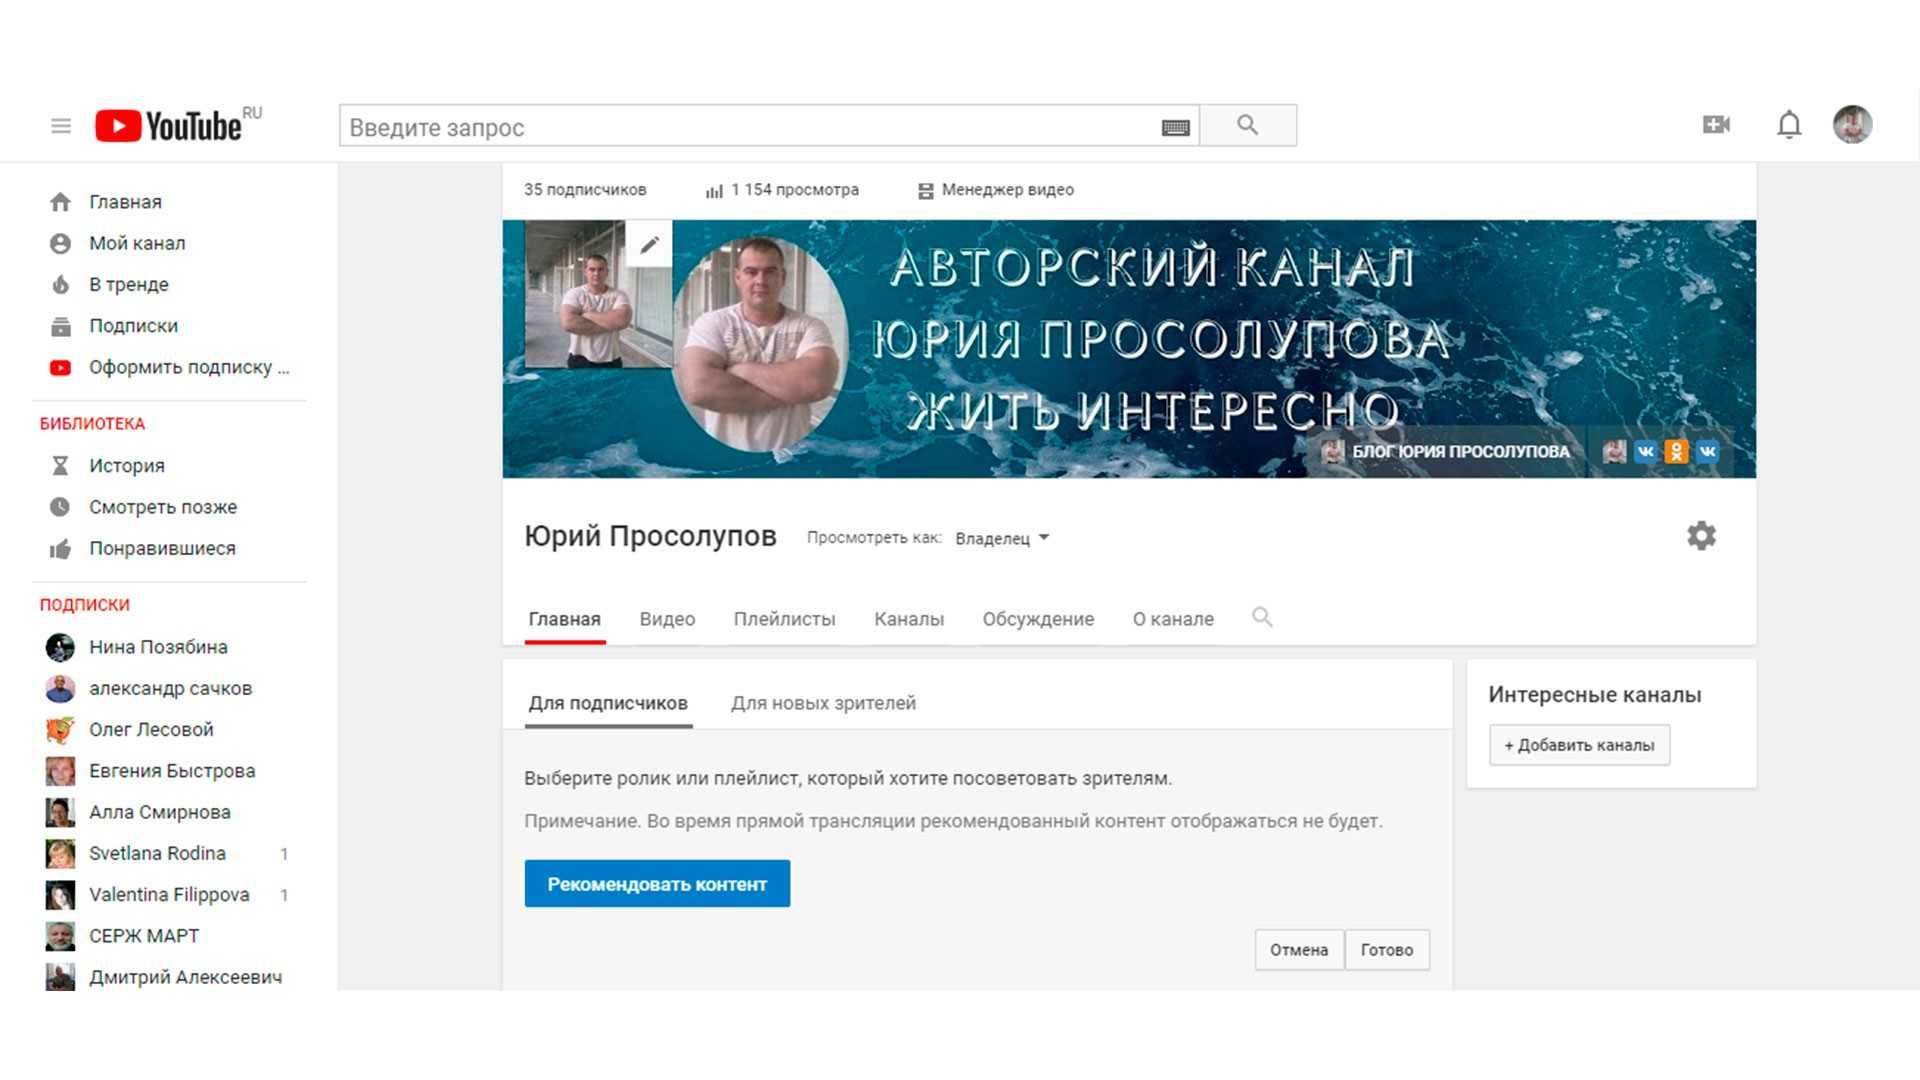 Как добавить значок канала Youtube